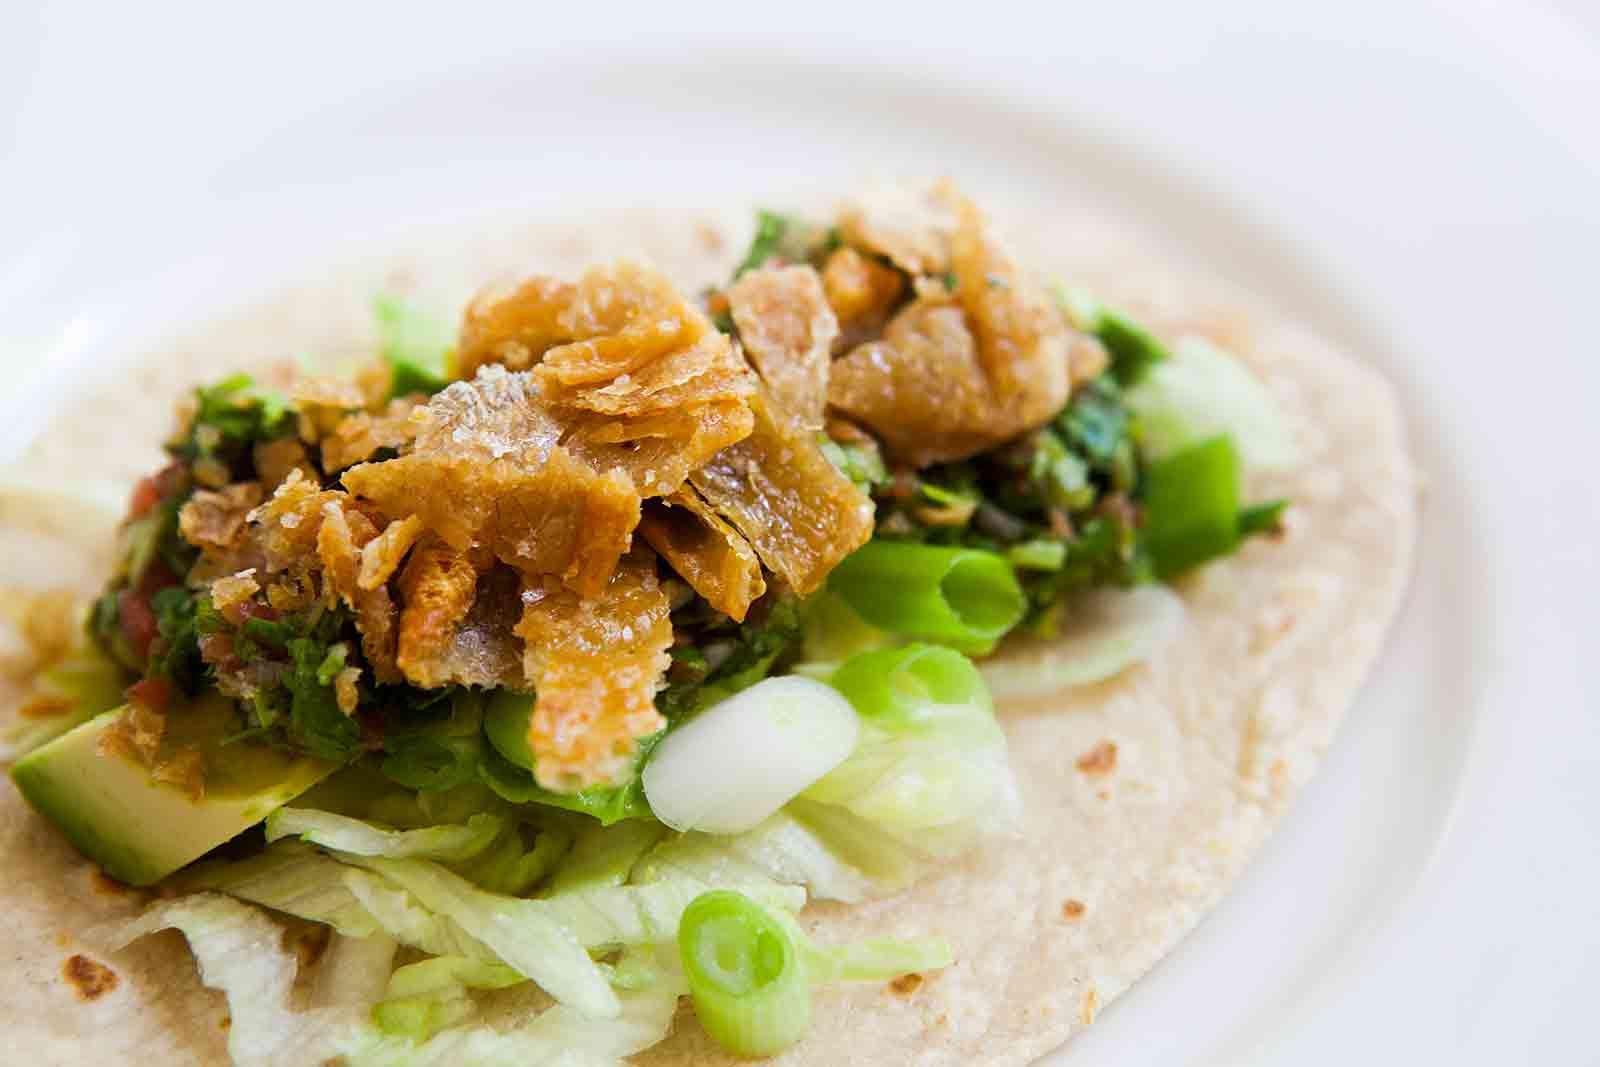 Chicken Skin Tacos with Habanero Salsa